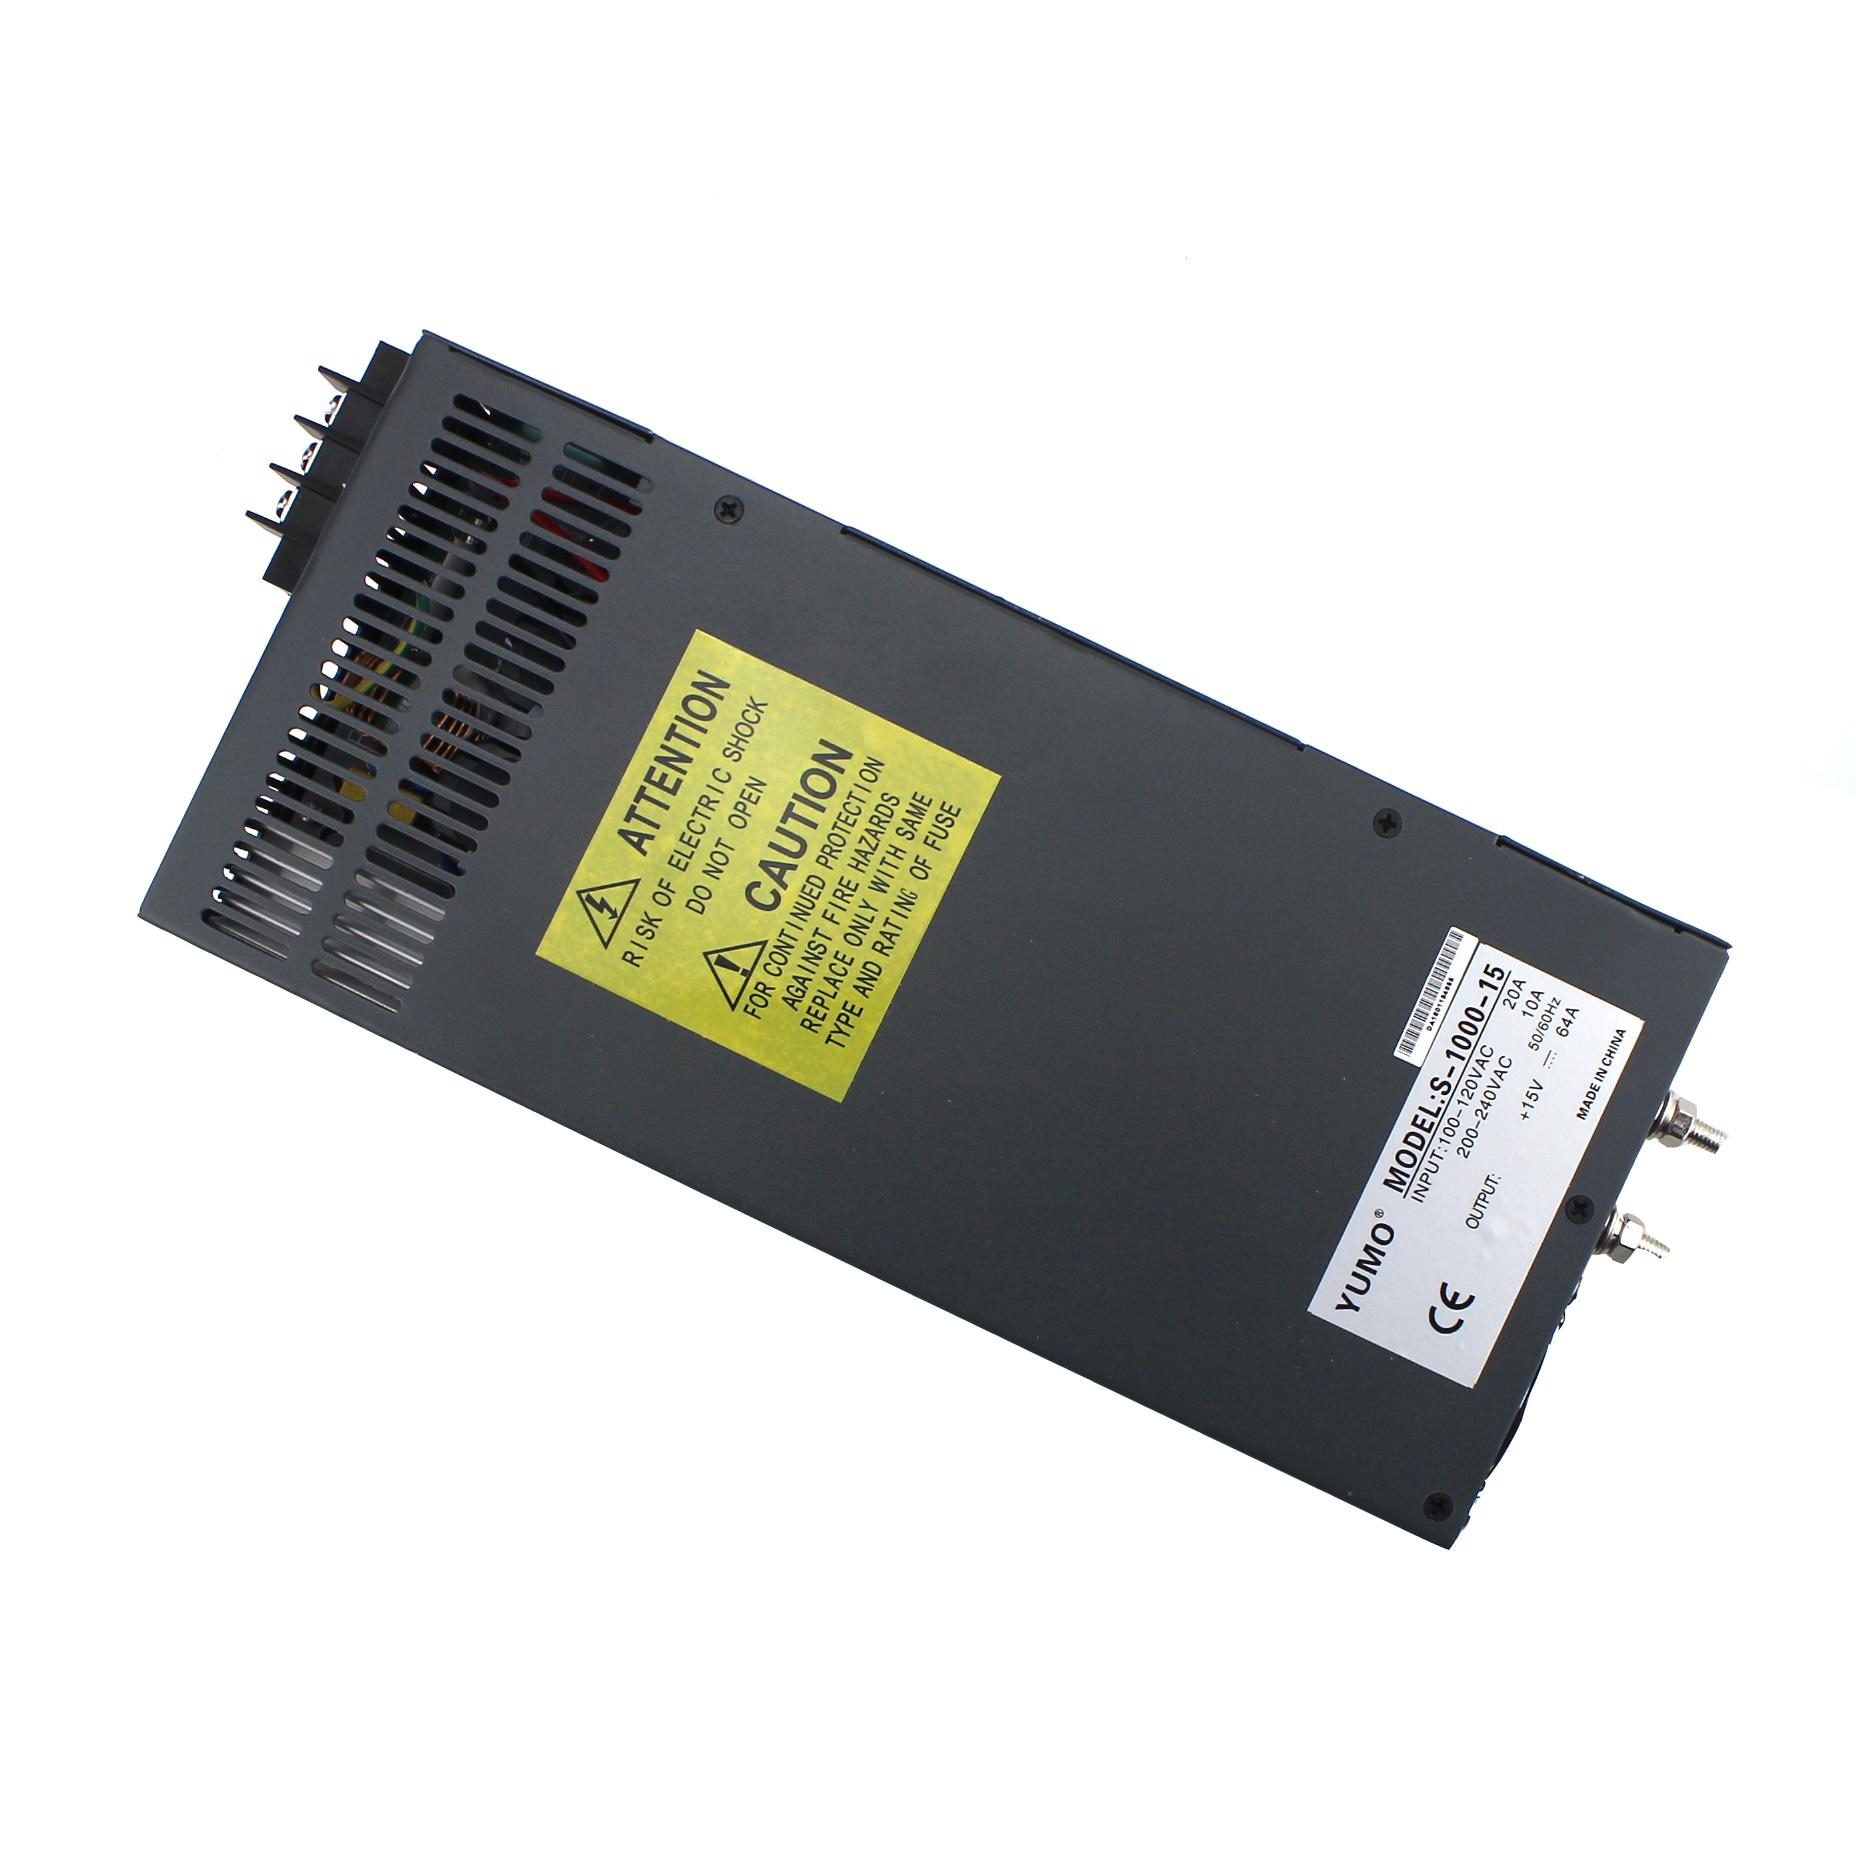 China led switching power supply,15V Switching Power Supply ...